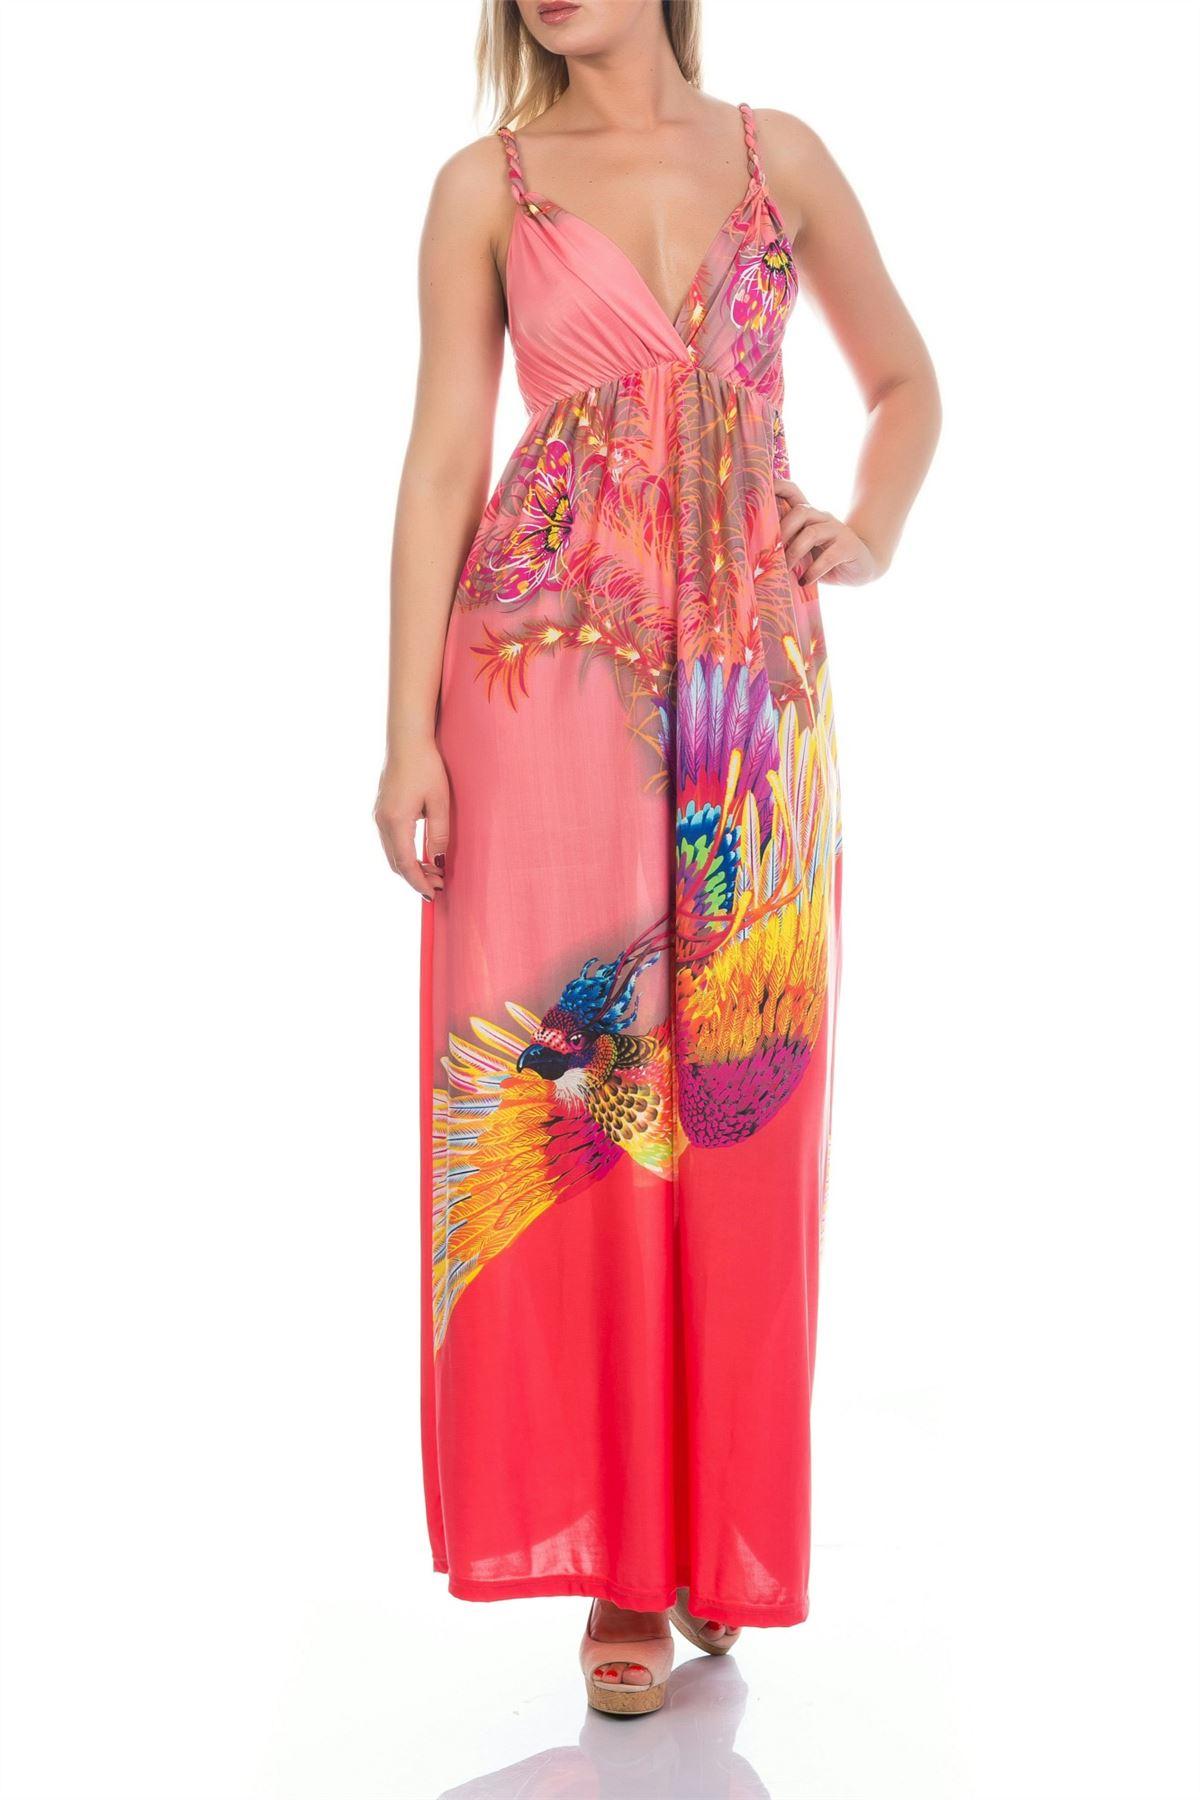 Martildo Womens Ladies Bright Tropical Holiday Summer Long ...